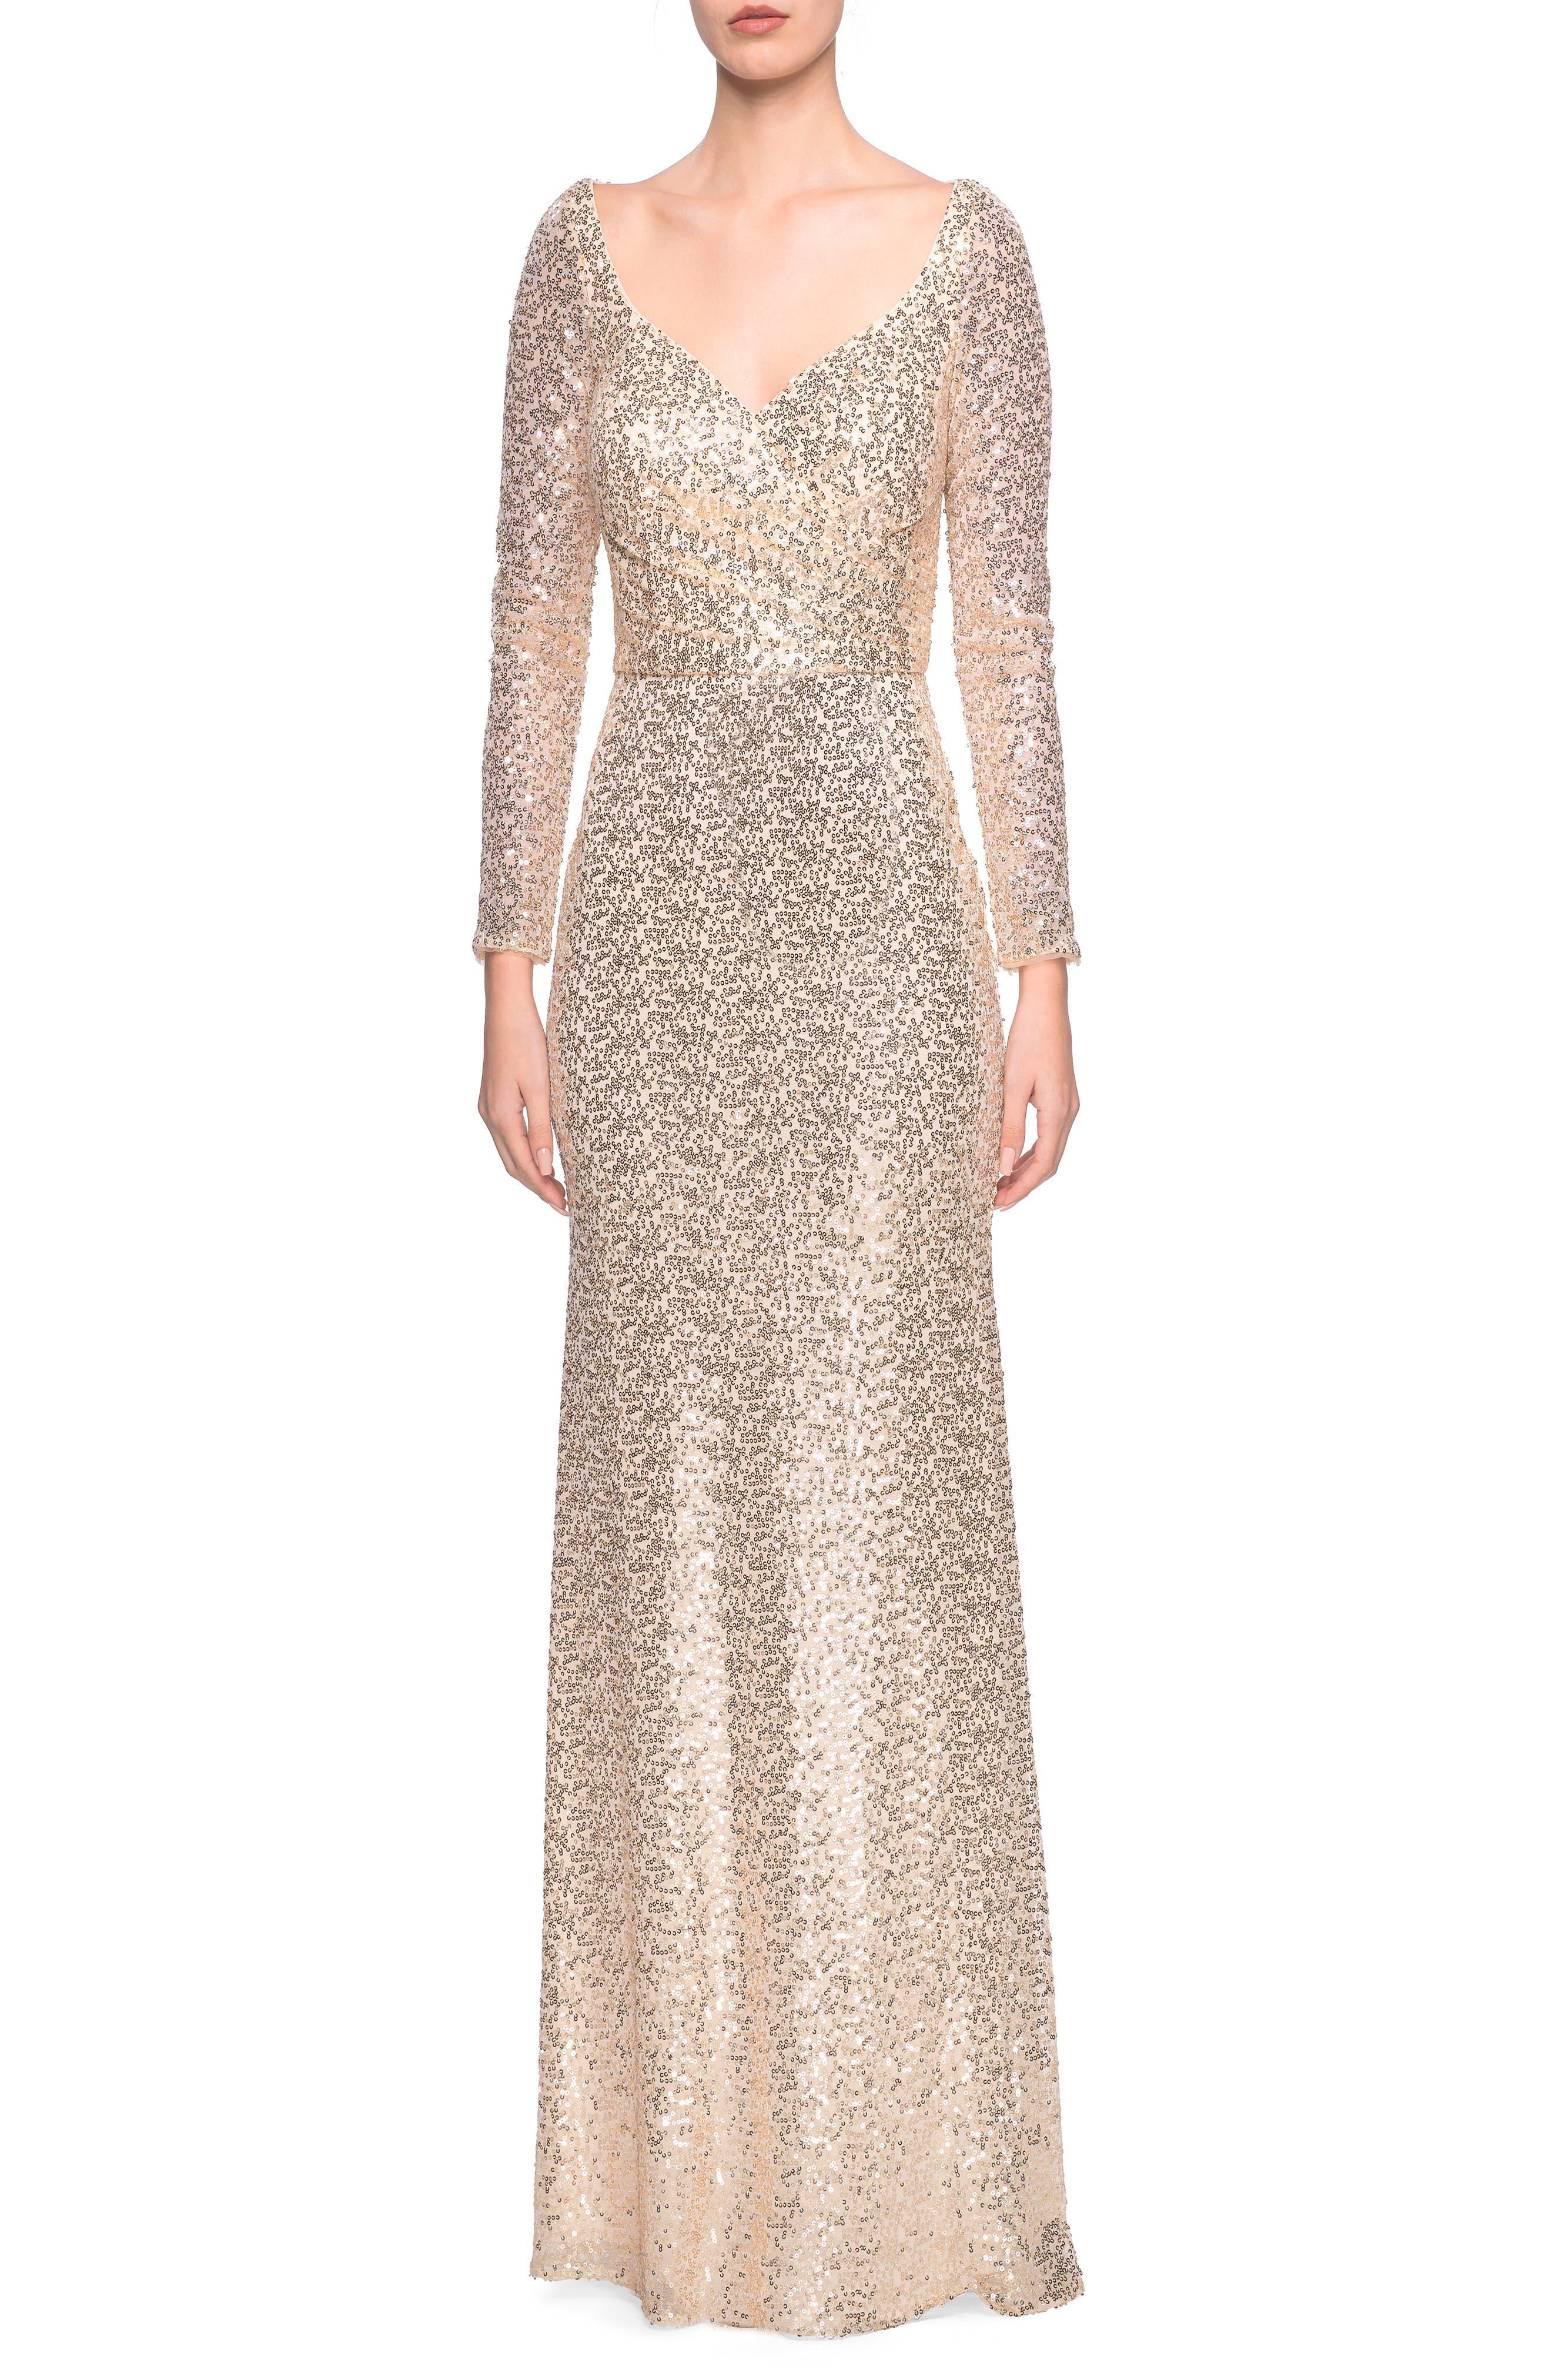 La Femme Wrap Bodice Sequin Evening Dress, 0 (similar to 20W-2) - Yellow